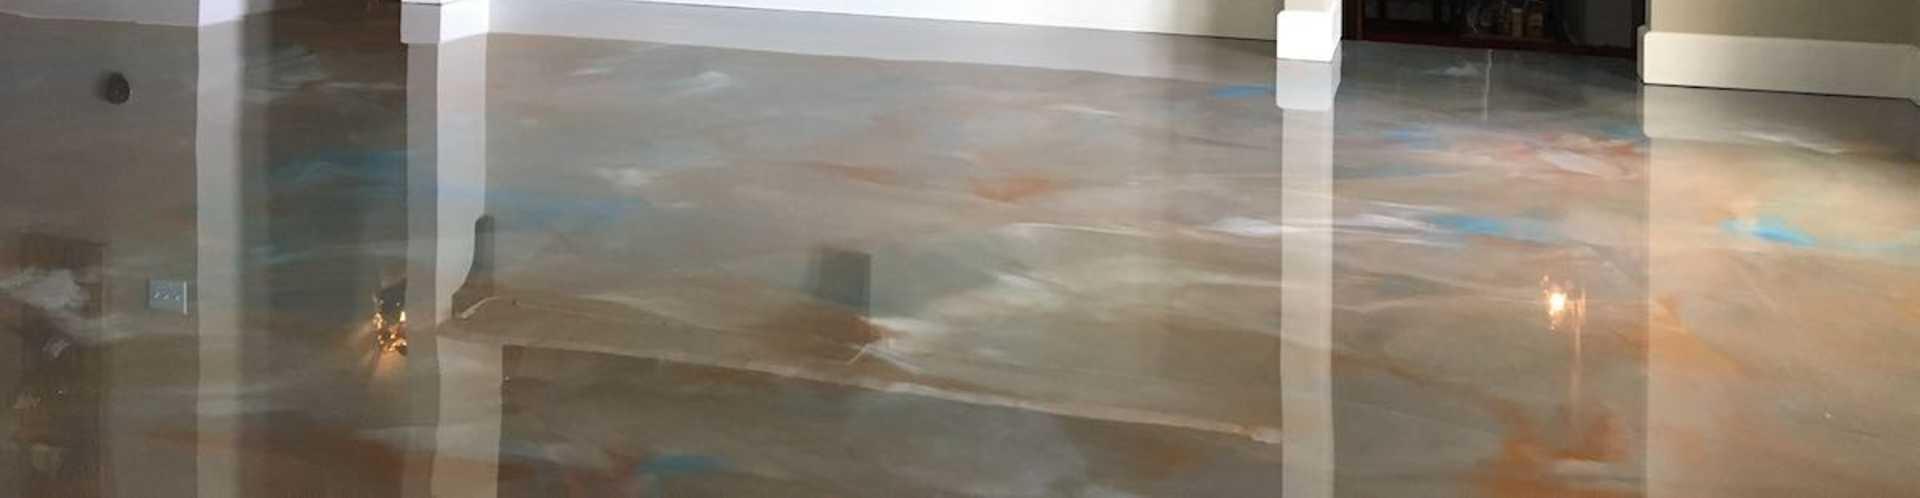 Finished Durable Basement Flooring